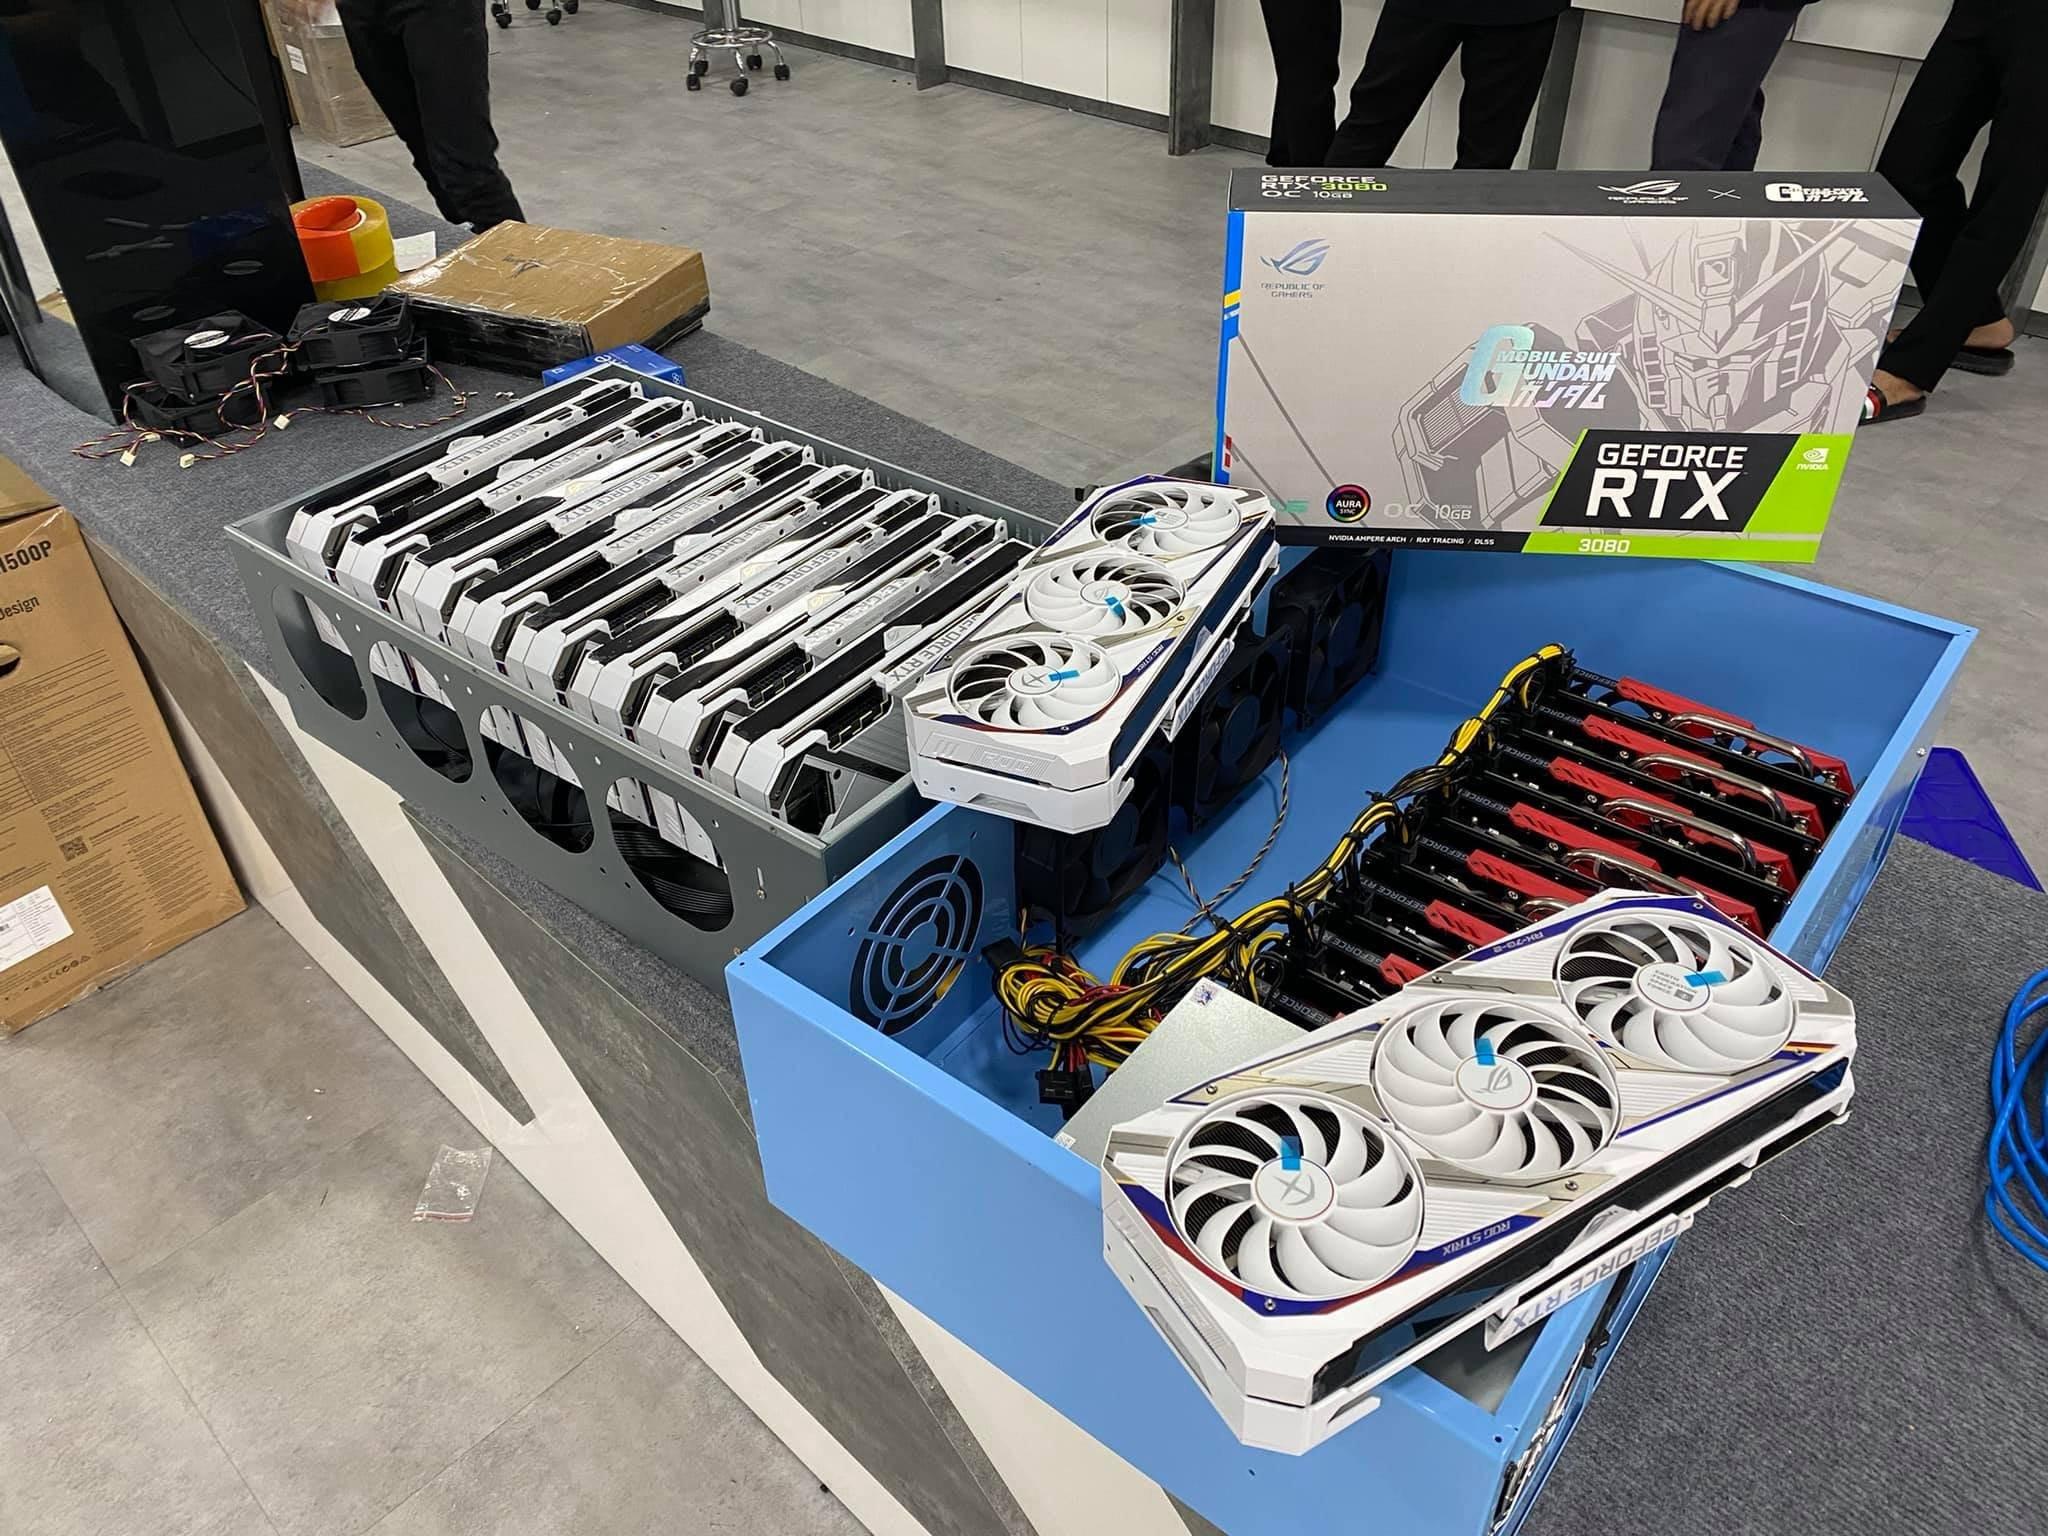 ASUS NVIDIA RTX 3080 GUNDAM